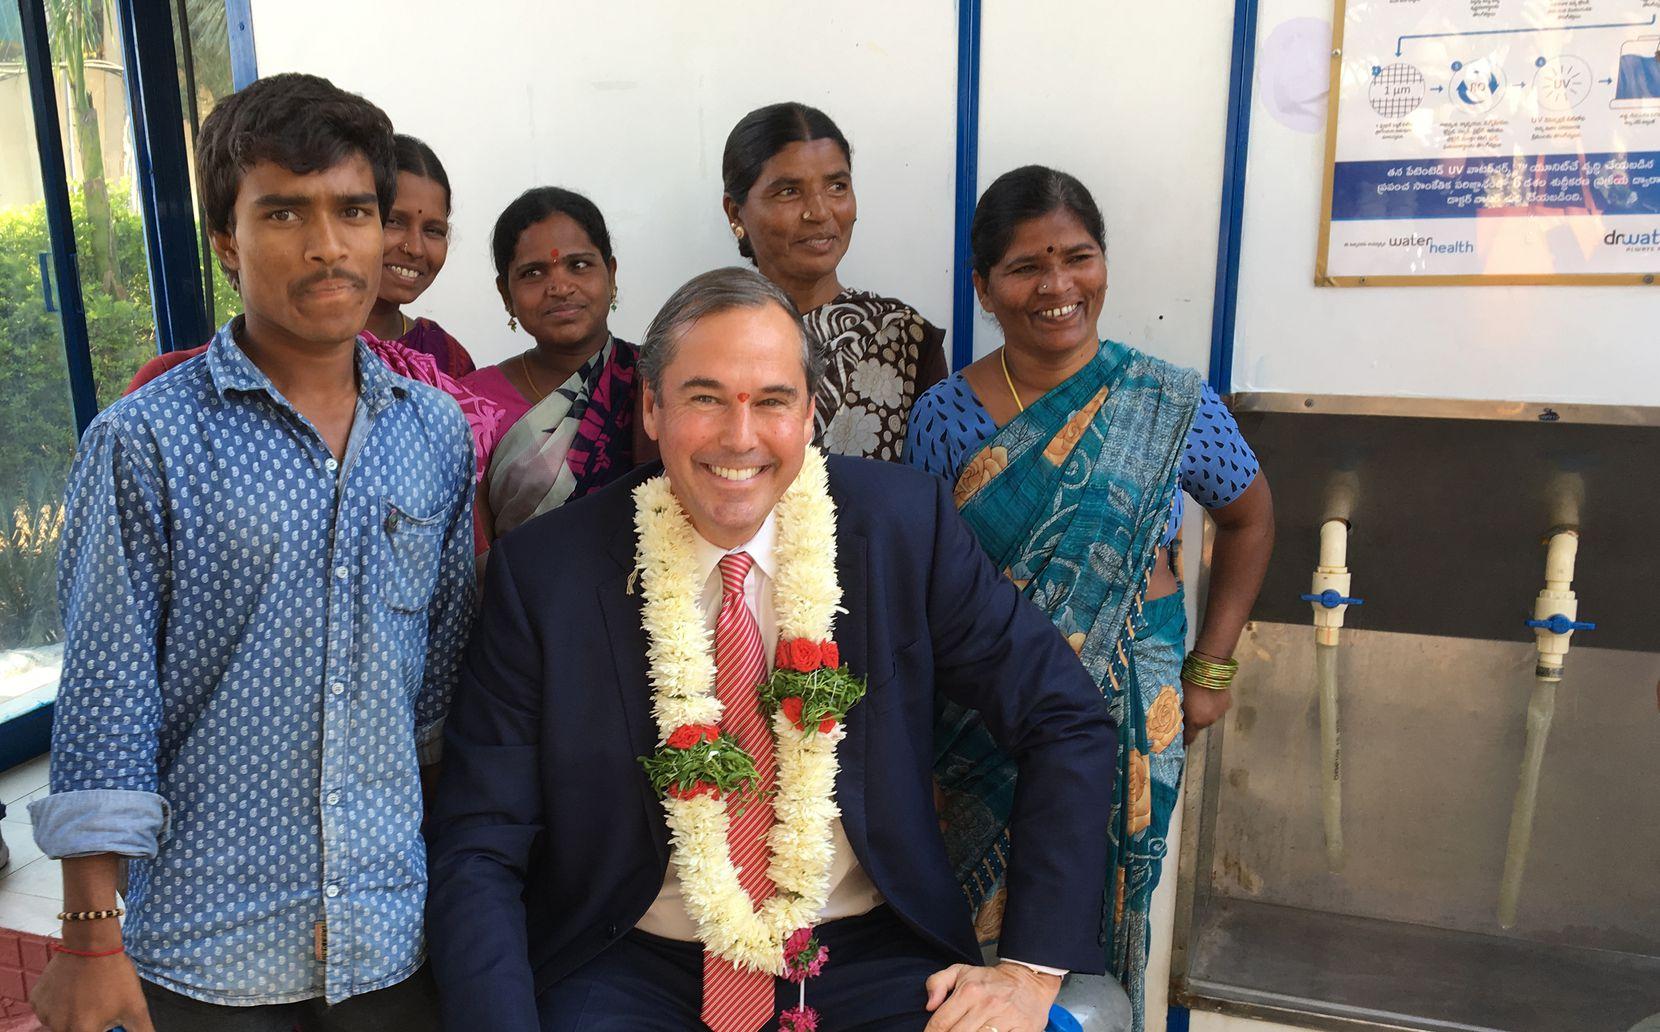 Ray Washburne visits a WaterHealth machine in India.